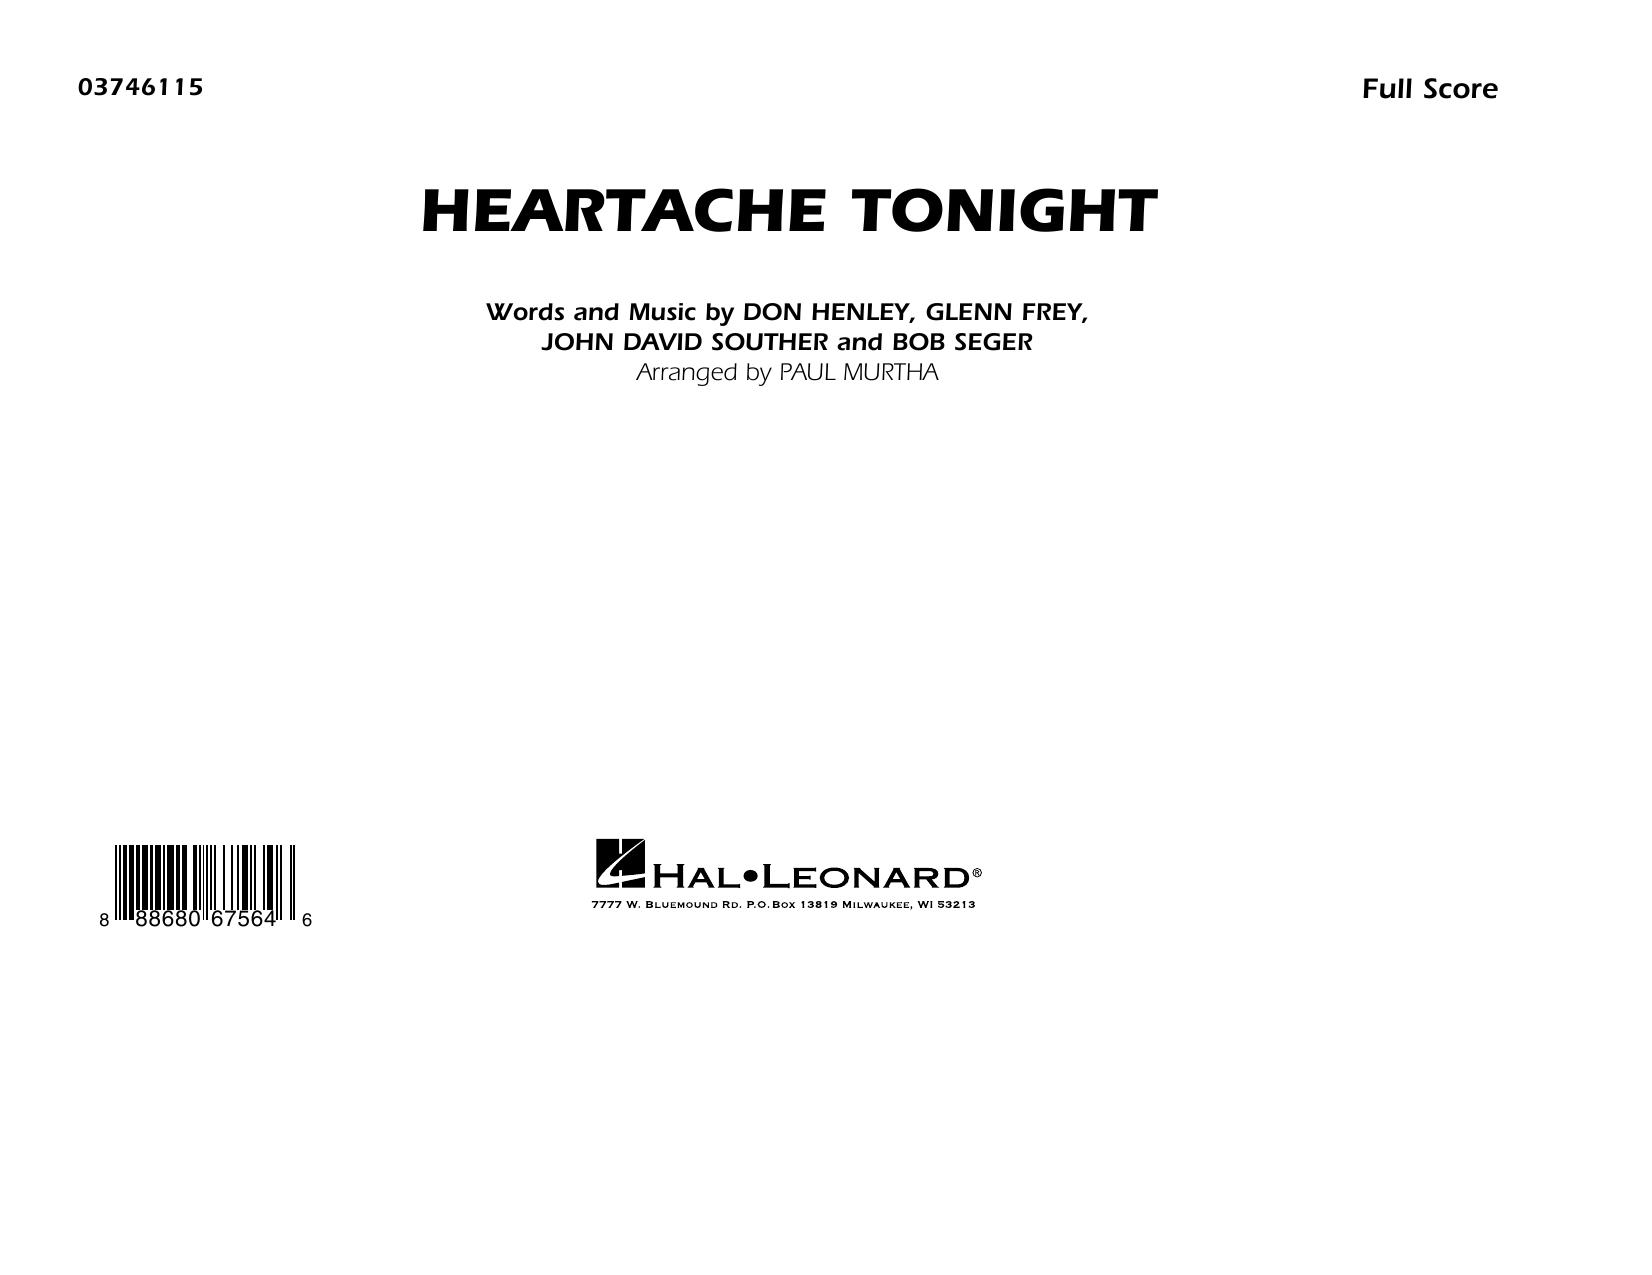 Heartache Tonight - Conductor Score (Full Score) Sheet Music